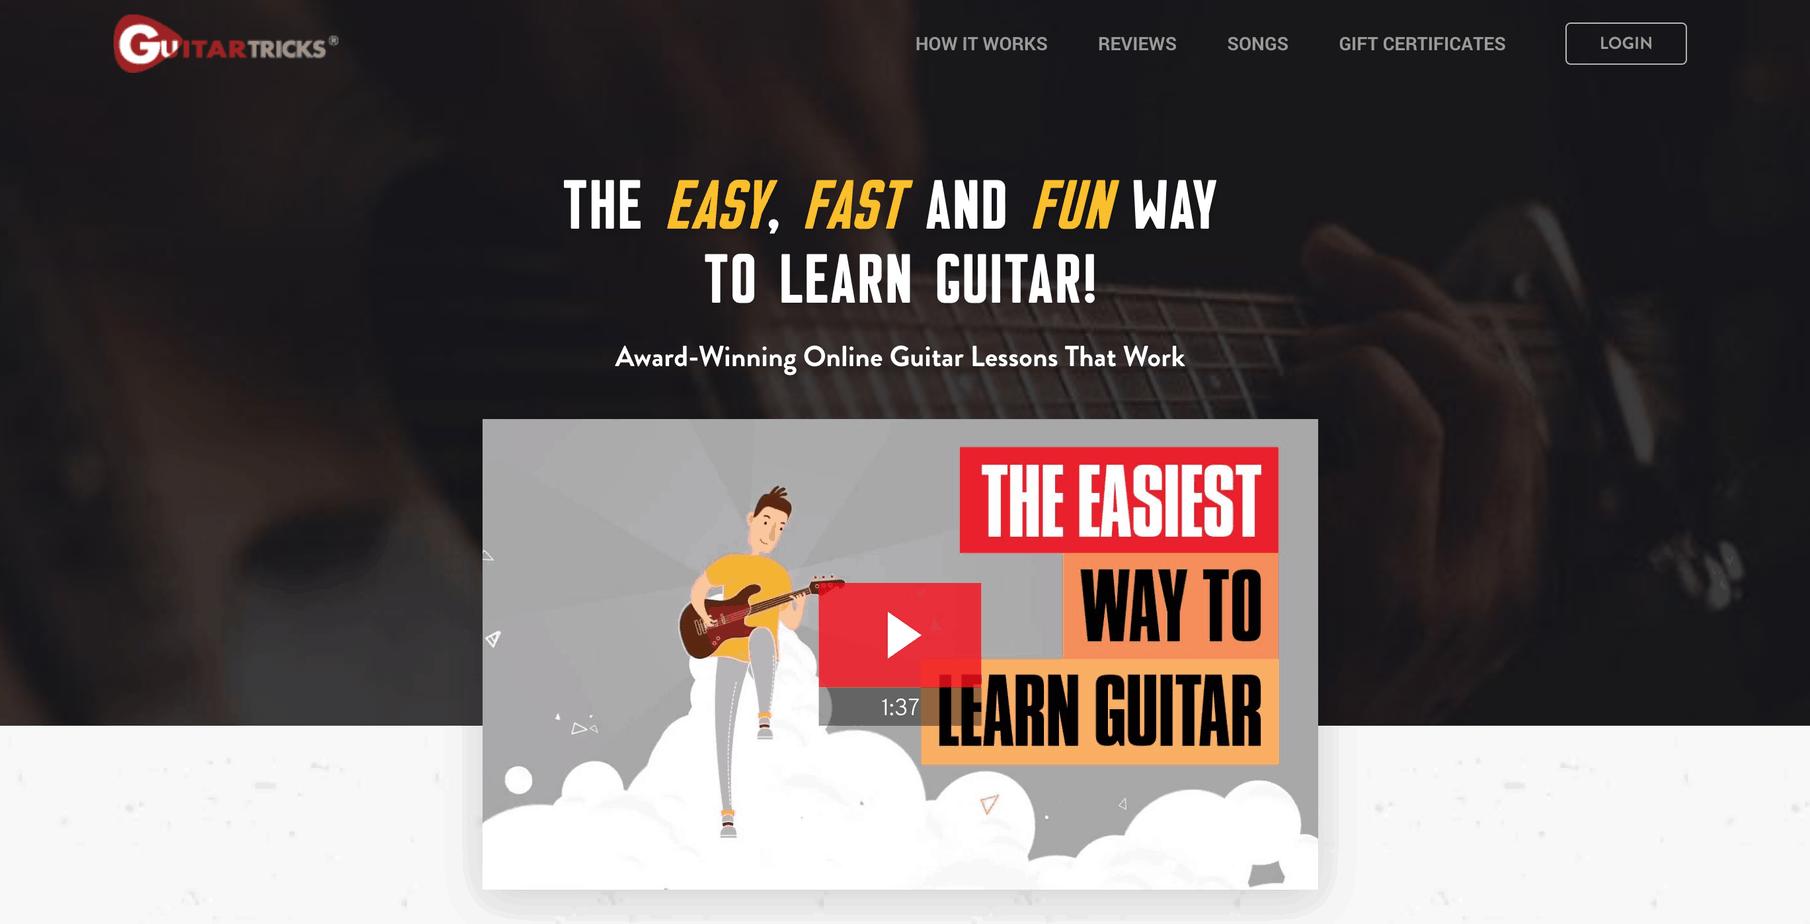 guitar tricks homepage